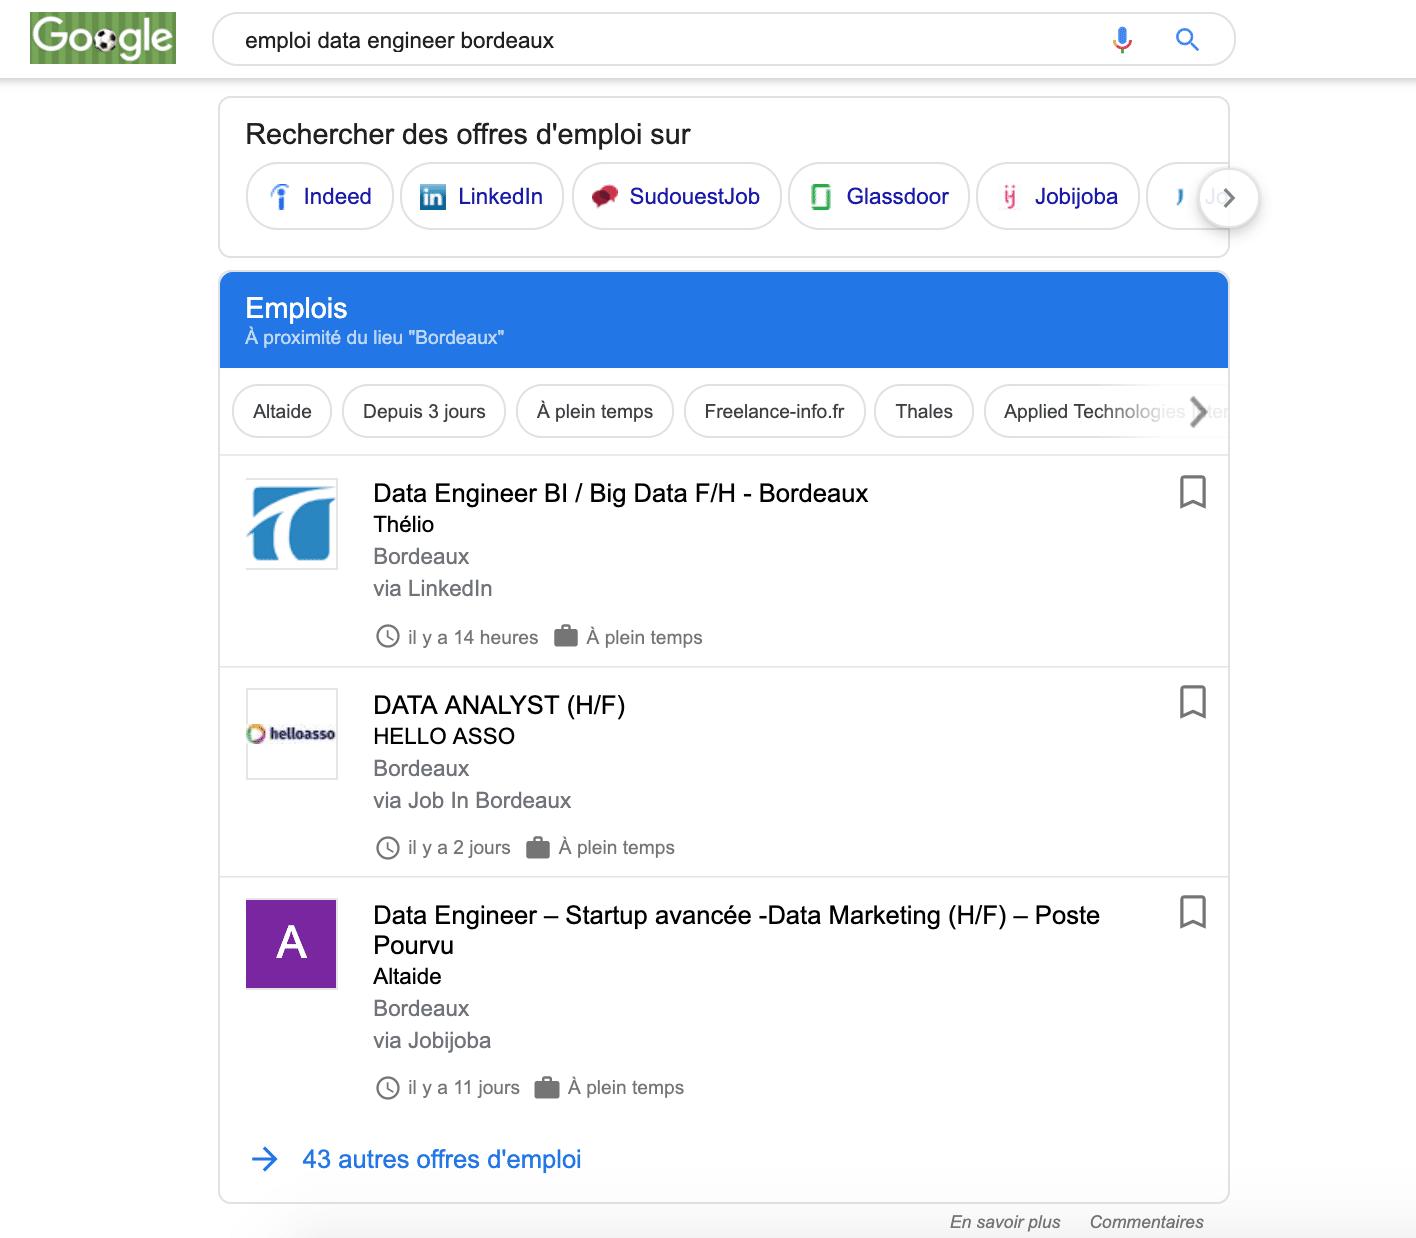 google emploi